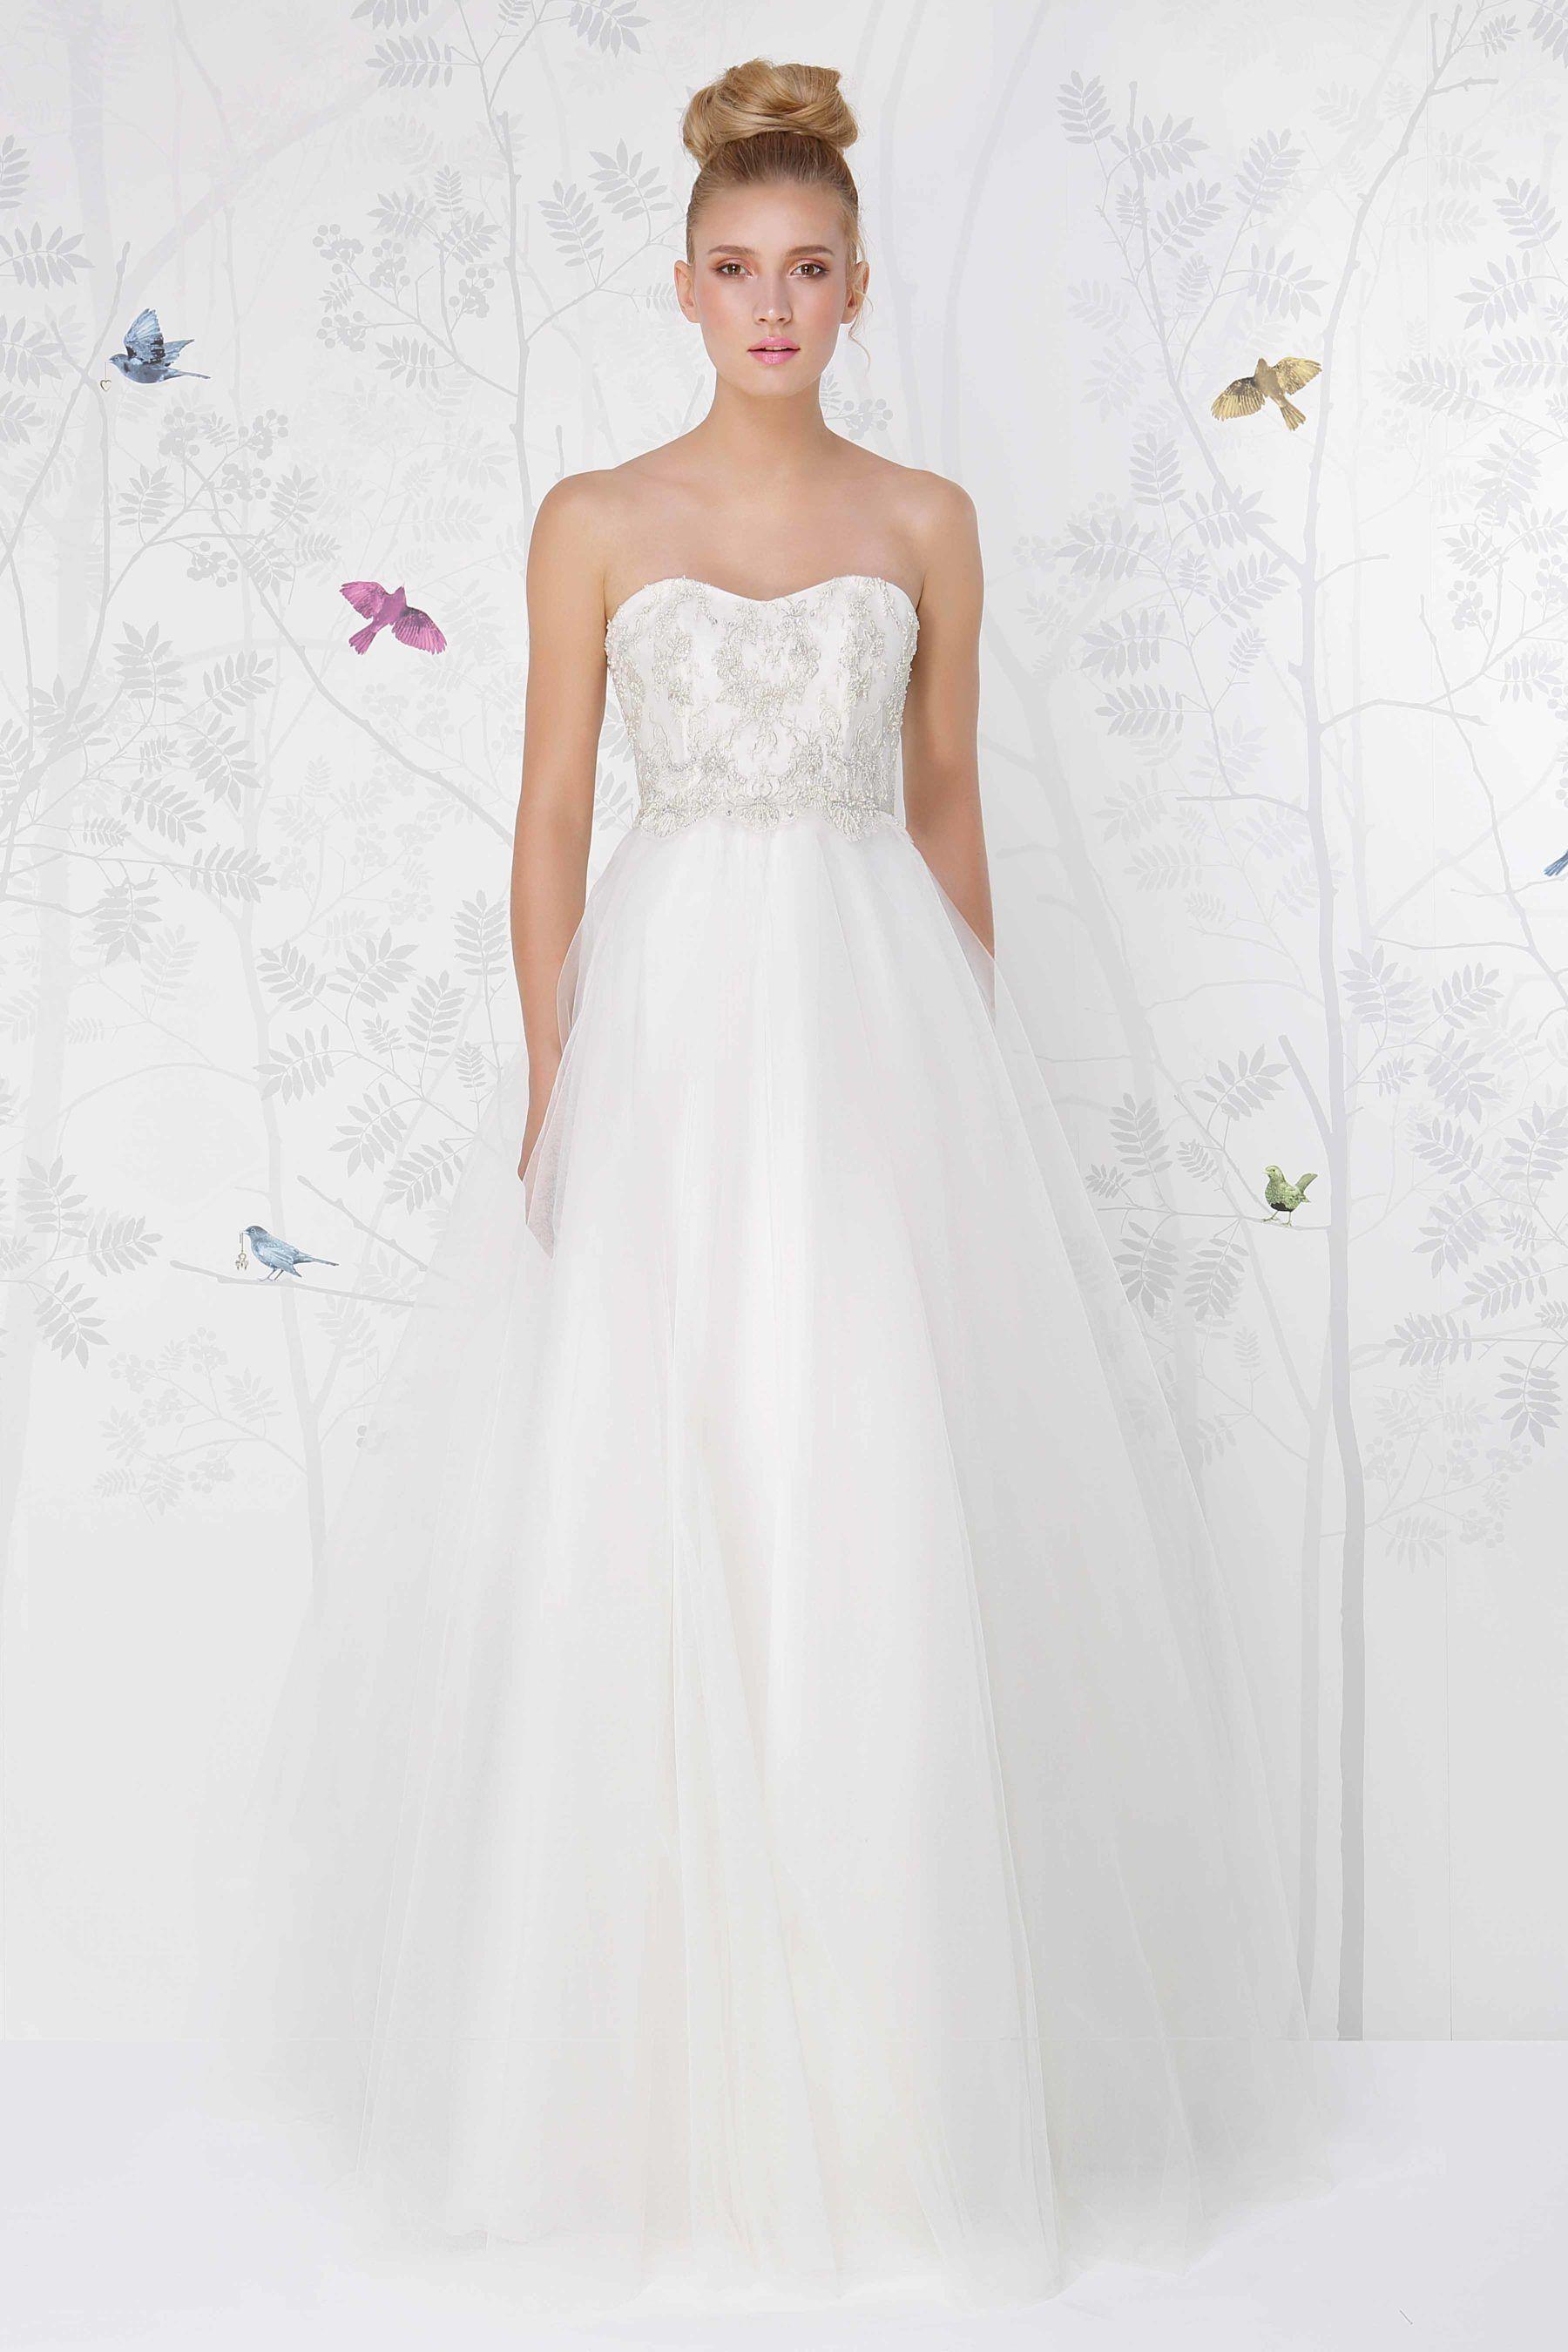 SADONI wedding dress LIANA with volumious tulle skirt and beaded sweetheart neckline